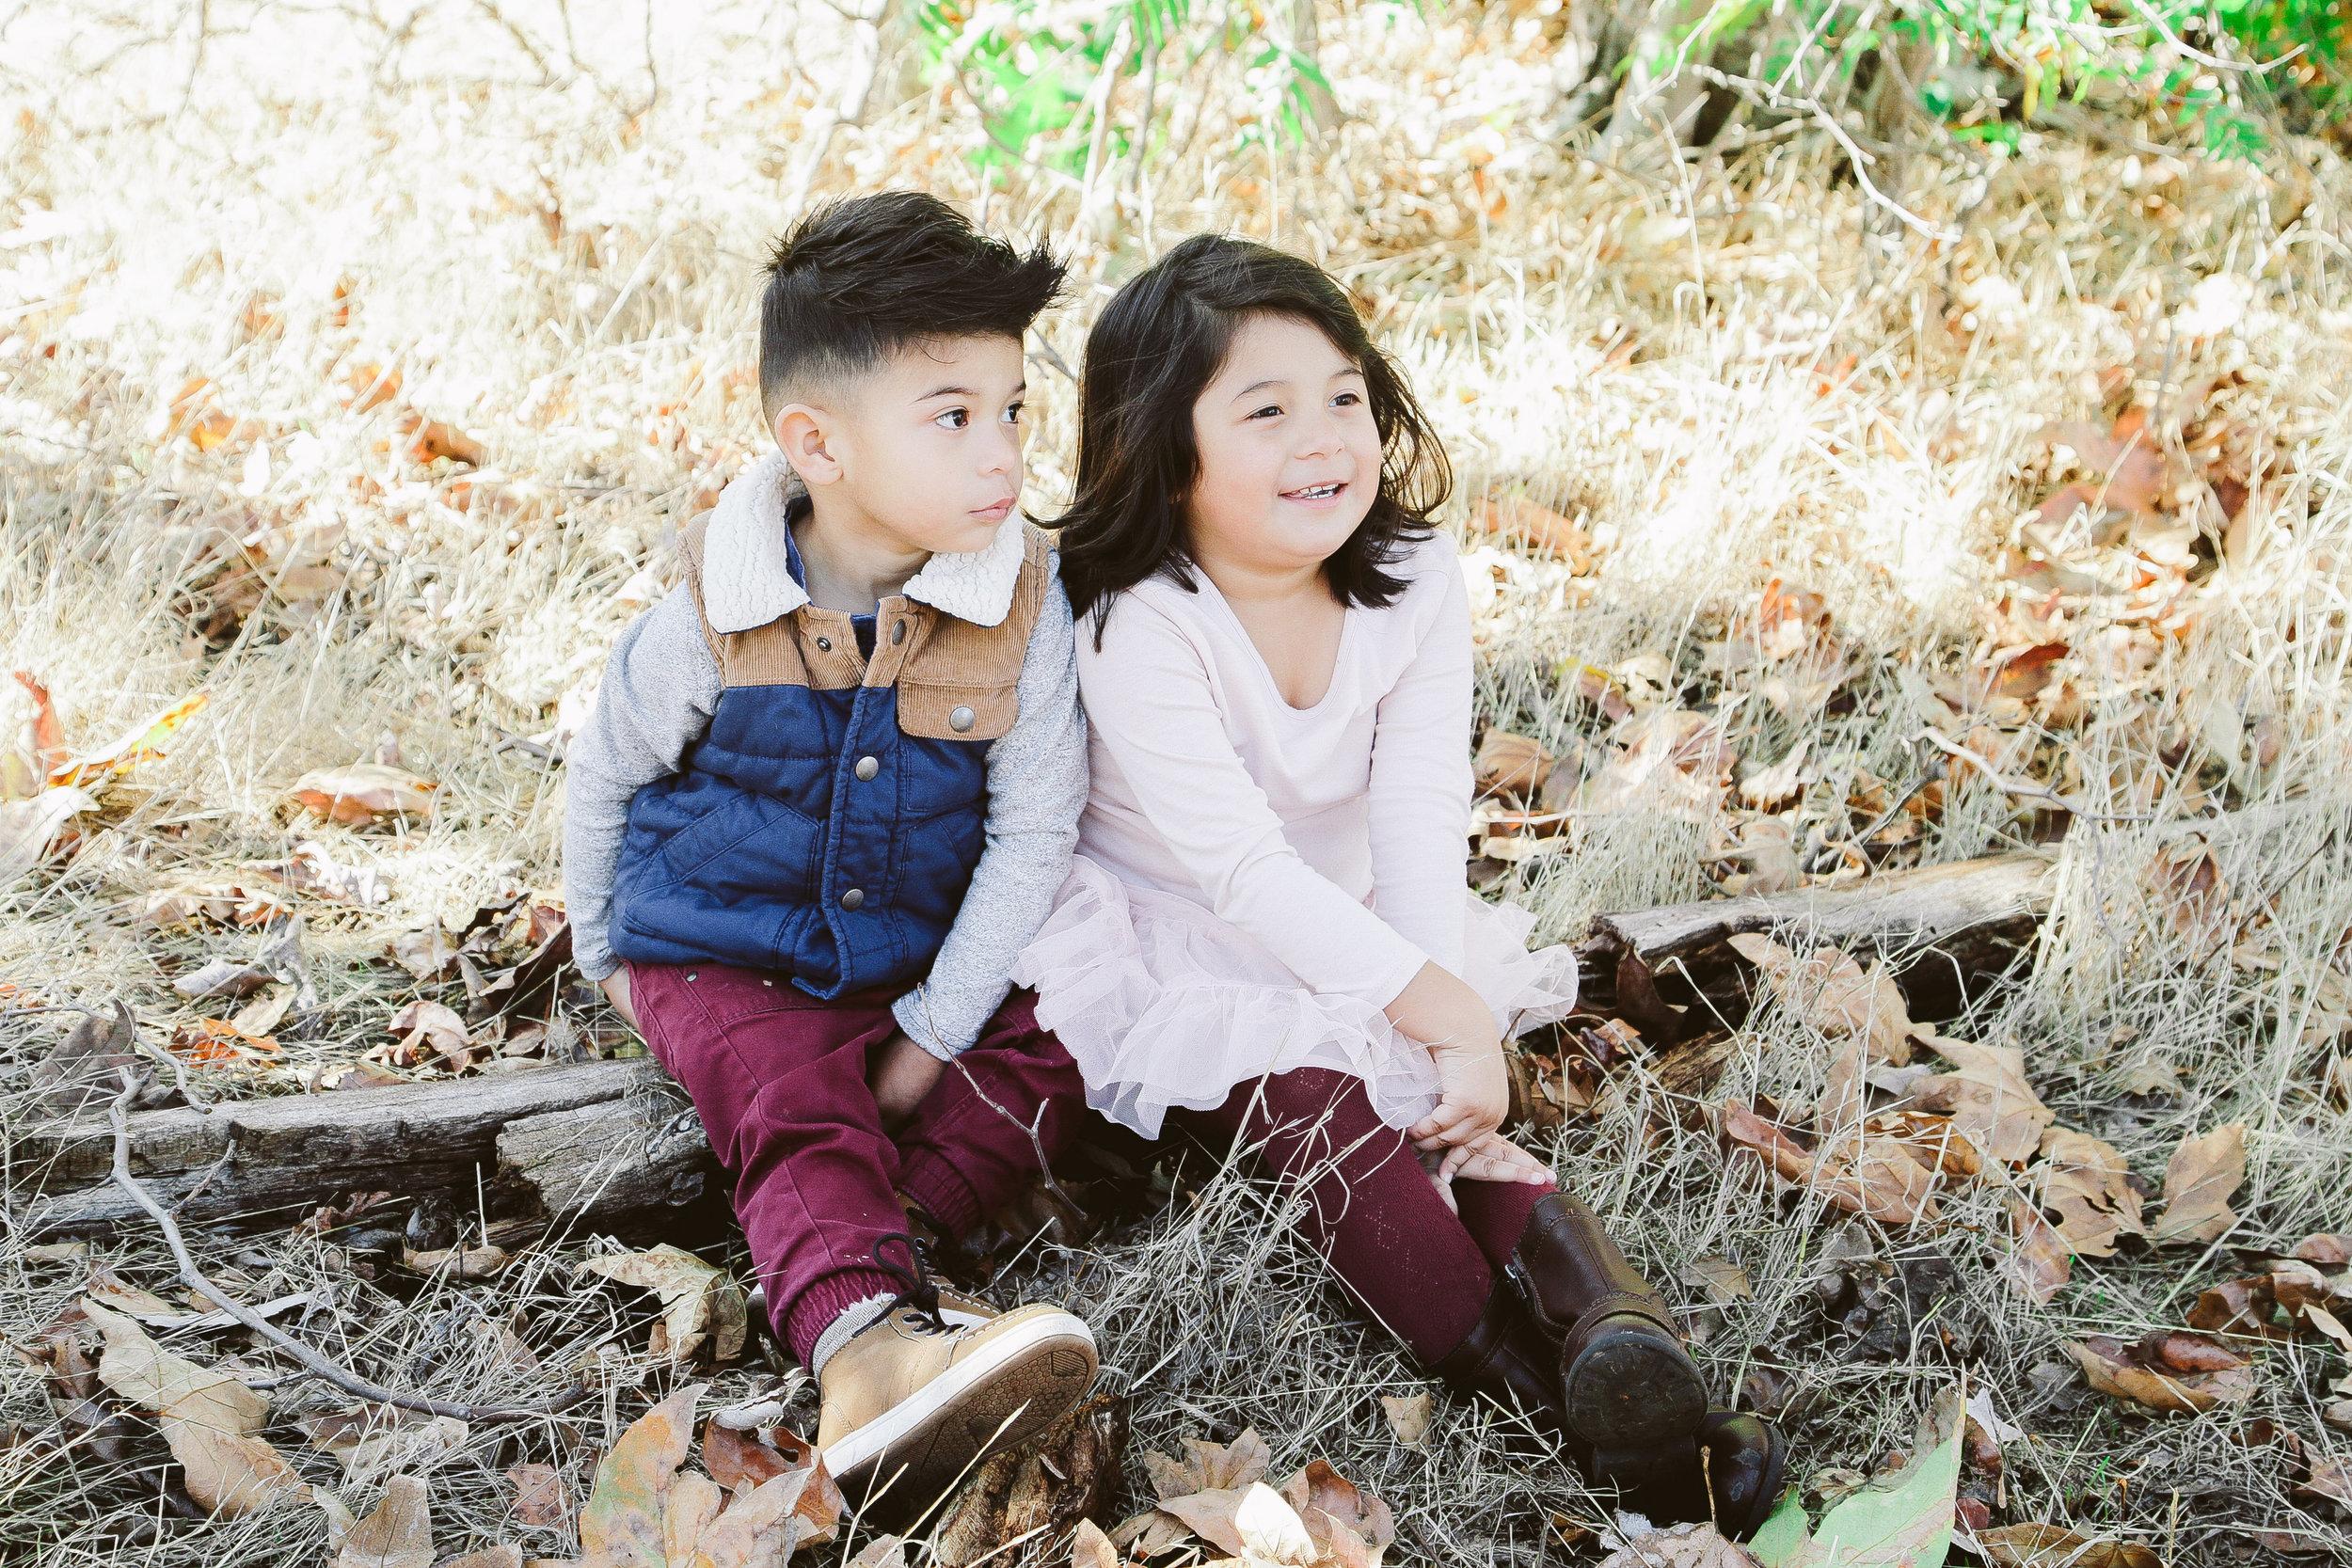 Dominguez Family Christmas 2015-Dominguez Christmas Famliy Final-0069.jpg